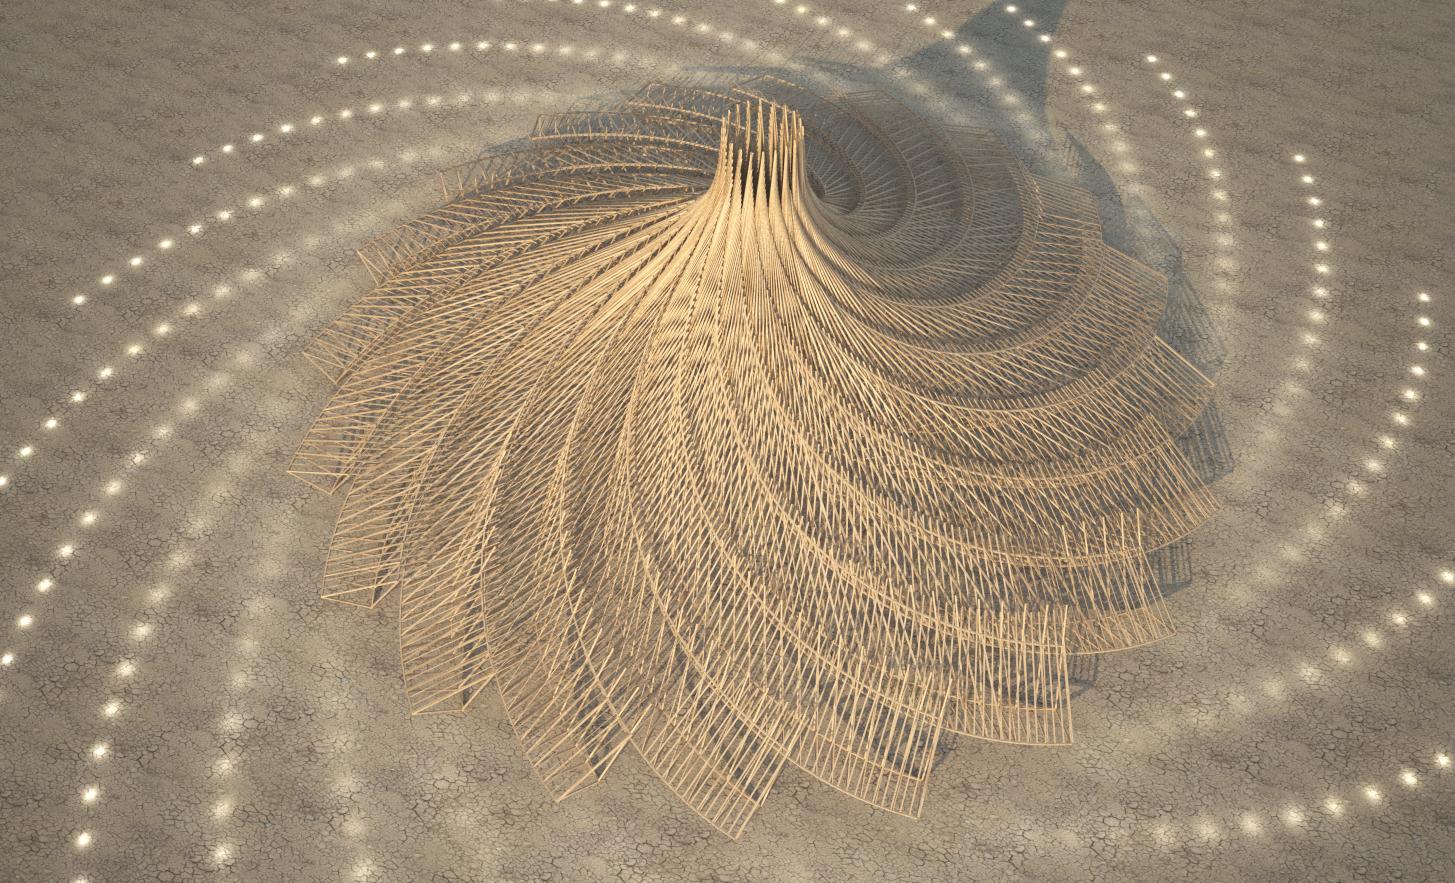 Galaxia - Burning Man Temple 2018 - Top View